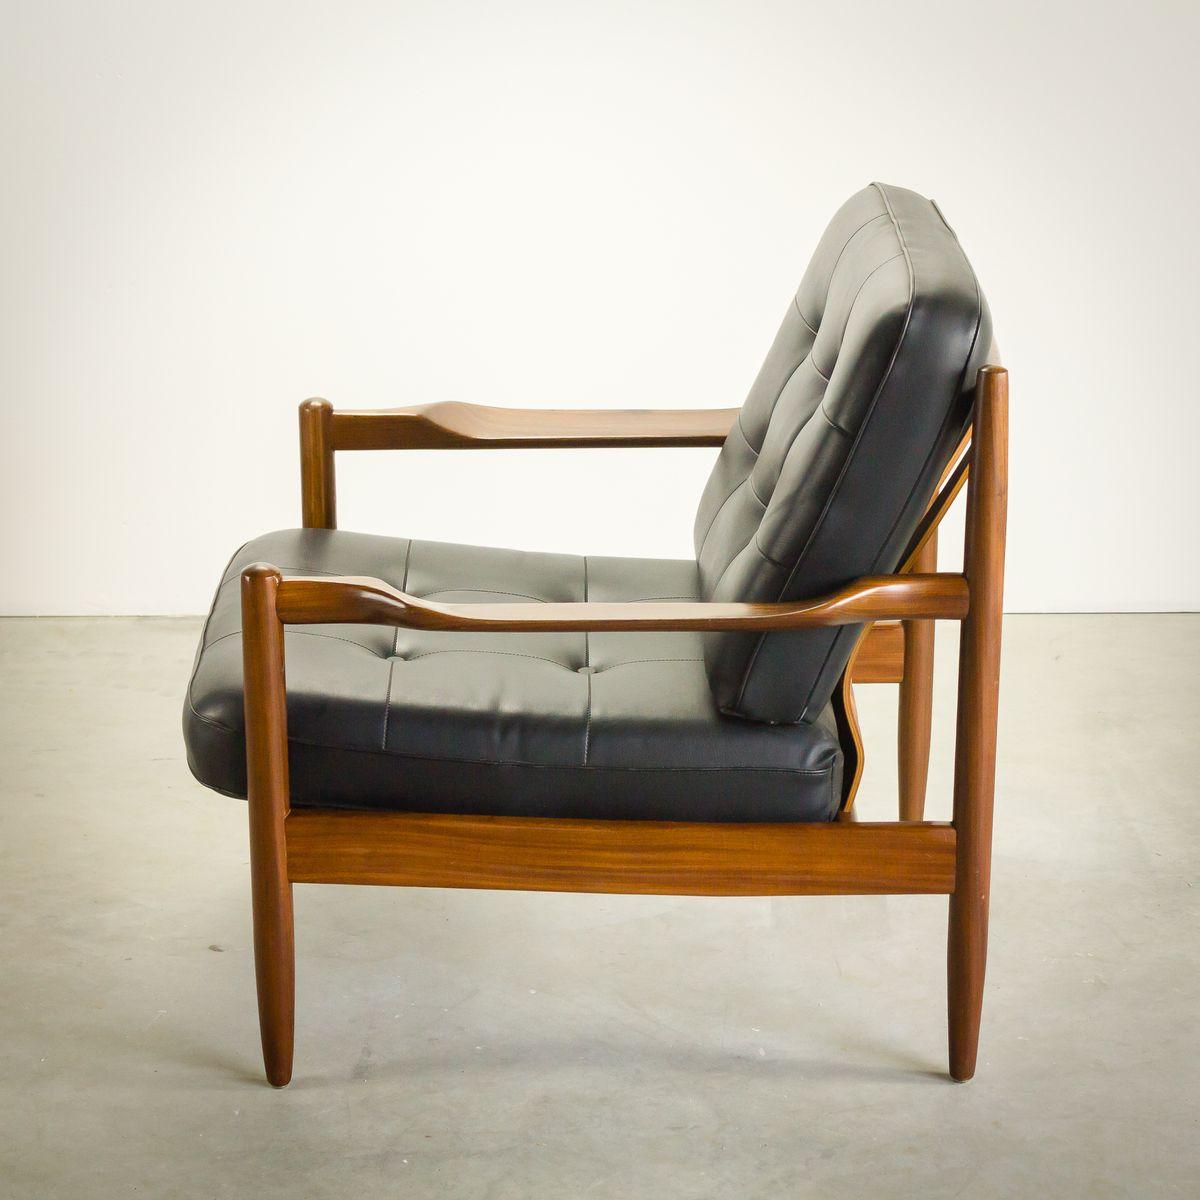 Lounge armlehnstuhl aus teak kunstleder von grete jalk for Armlehnstuhl kunstleder